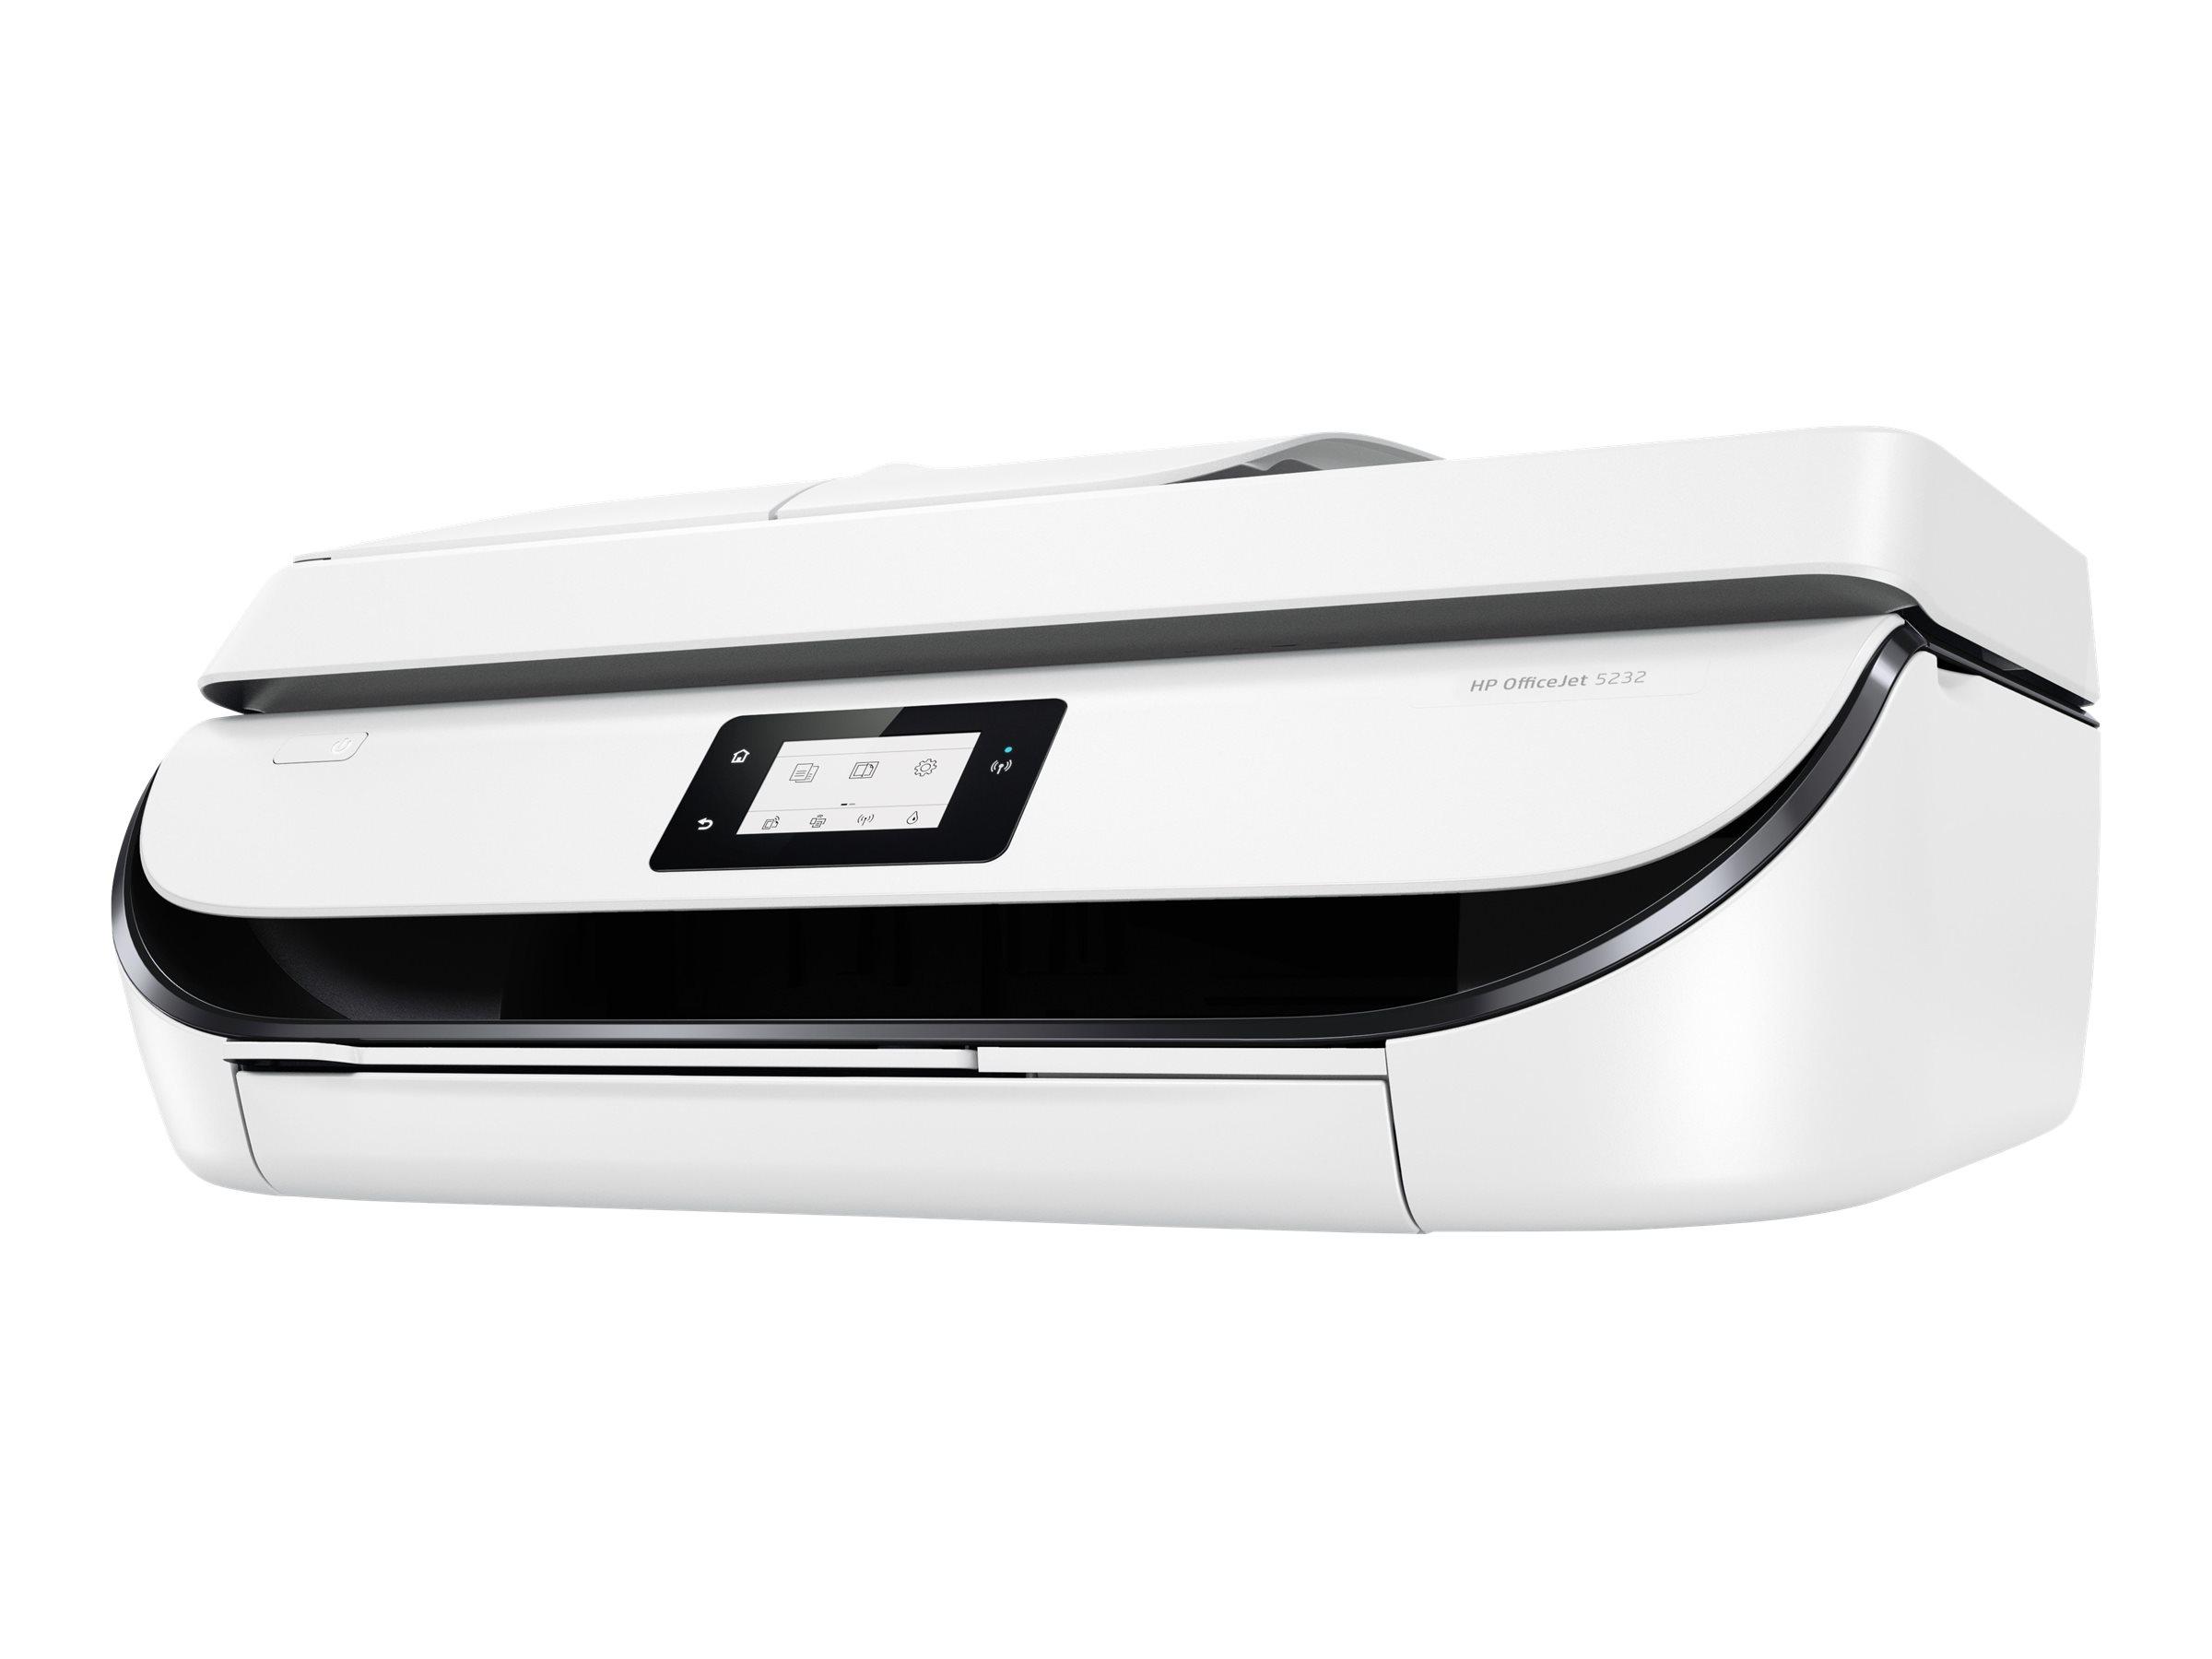 HP Officejet 5232 All-in-One - Multifunktionsdrucker - Farbe - Tintenstrahl - Legal (216 x 356 mm)